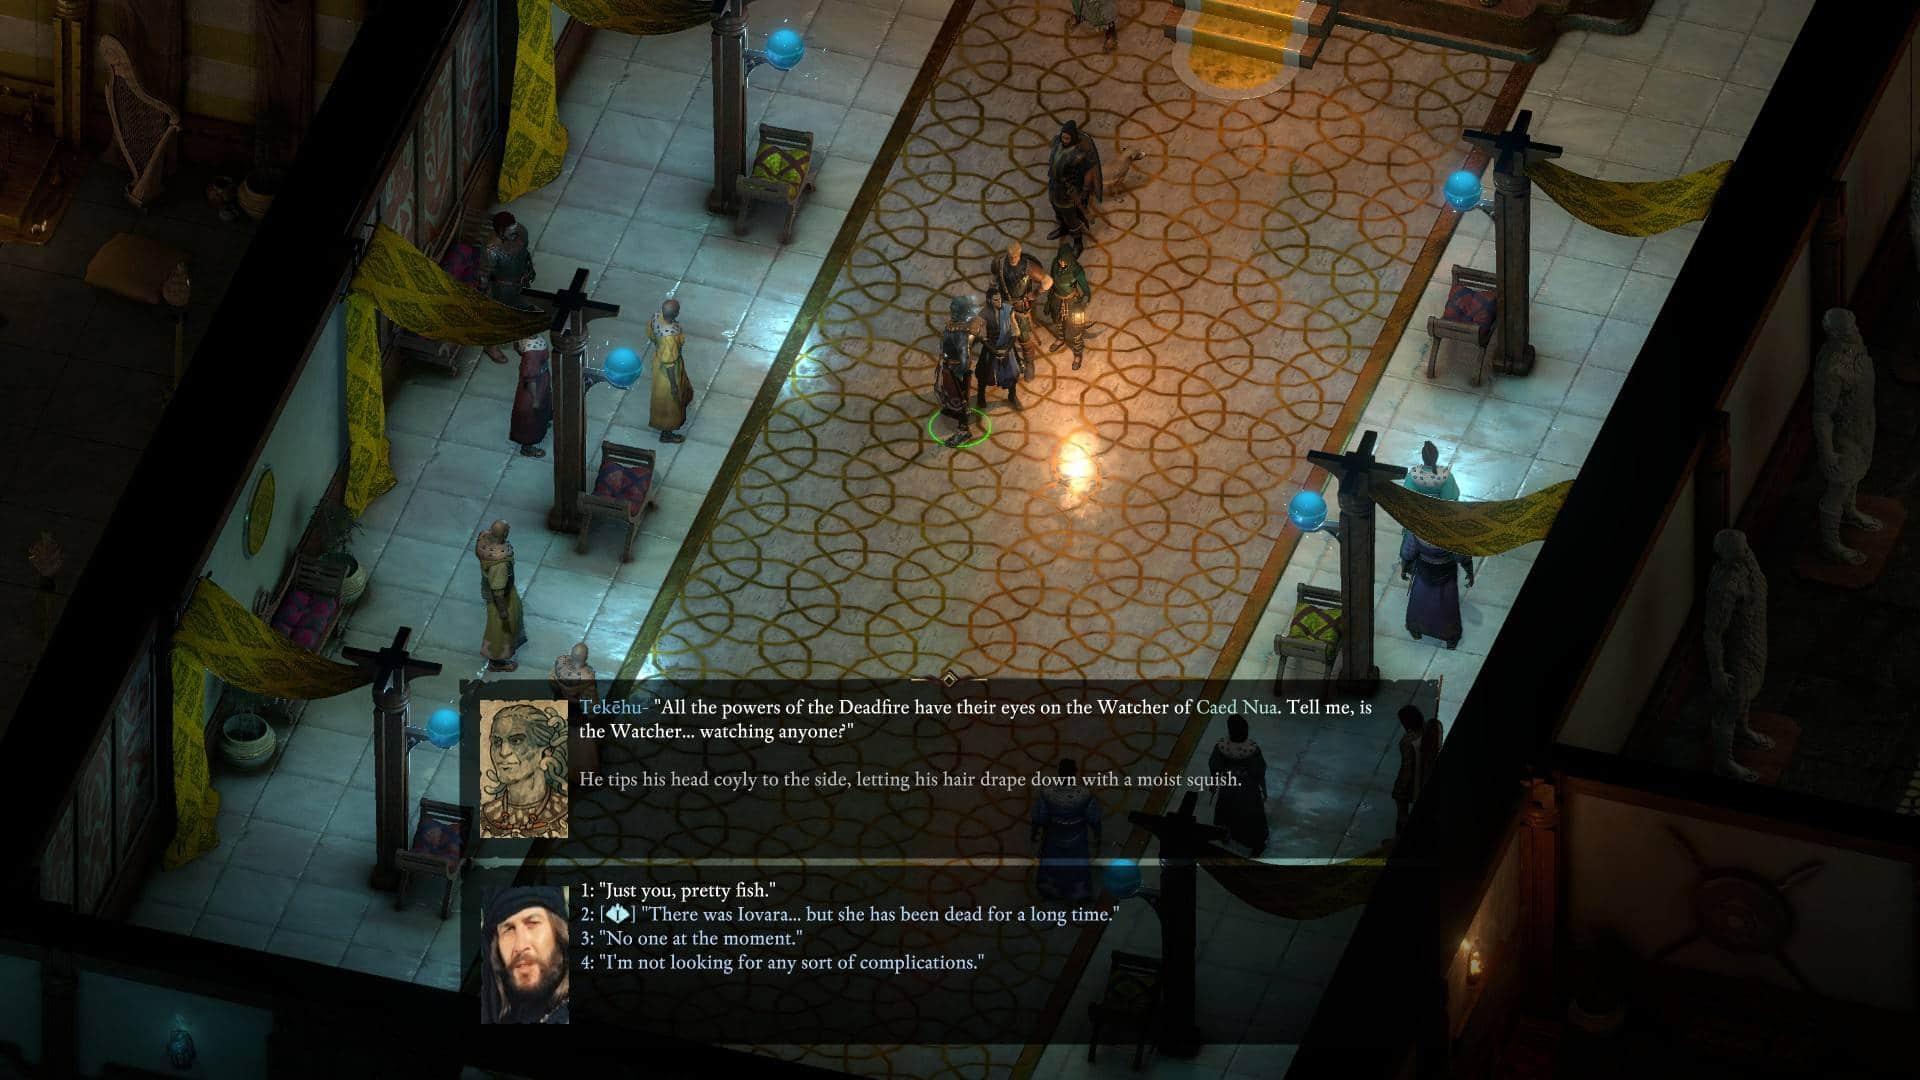 Eternity - Pillars of Eternity 2: Deadfire Pre-DLC Thread